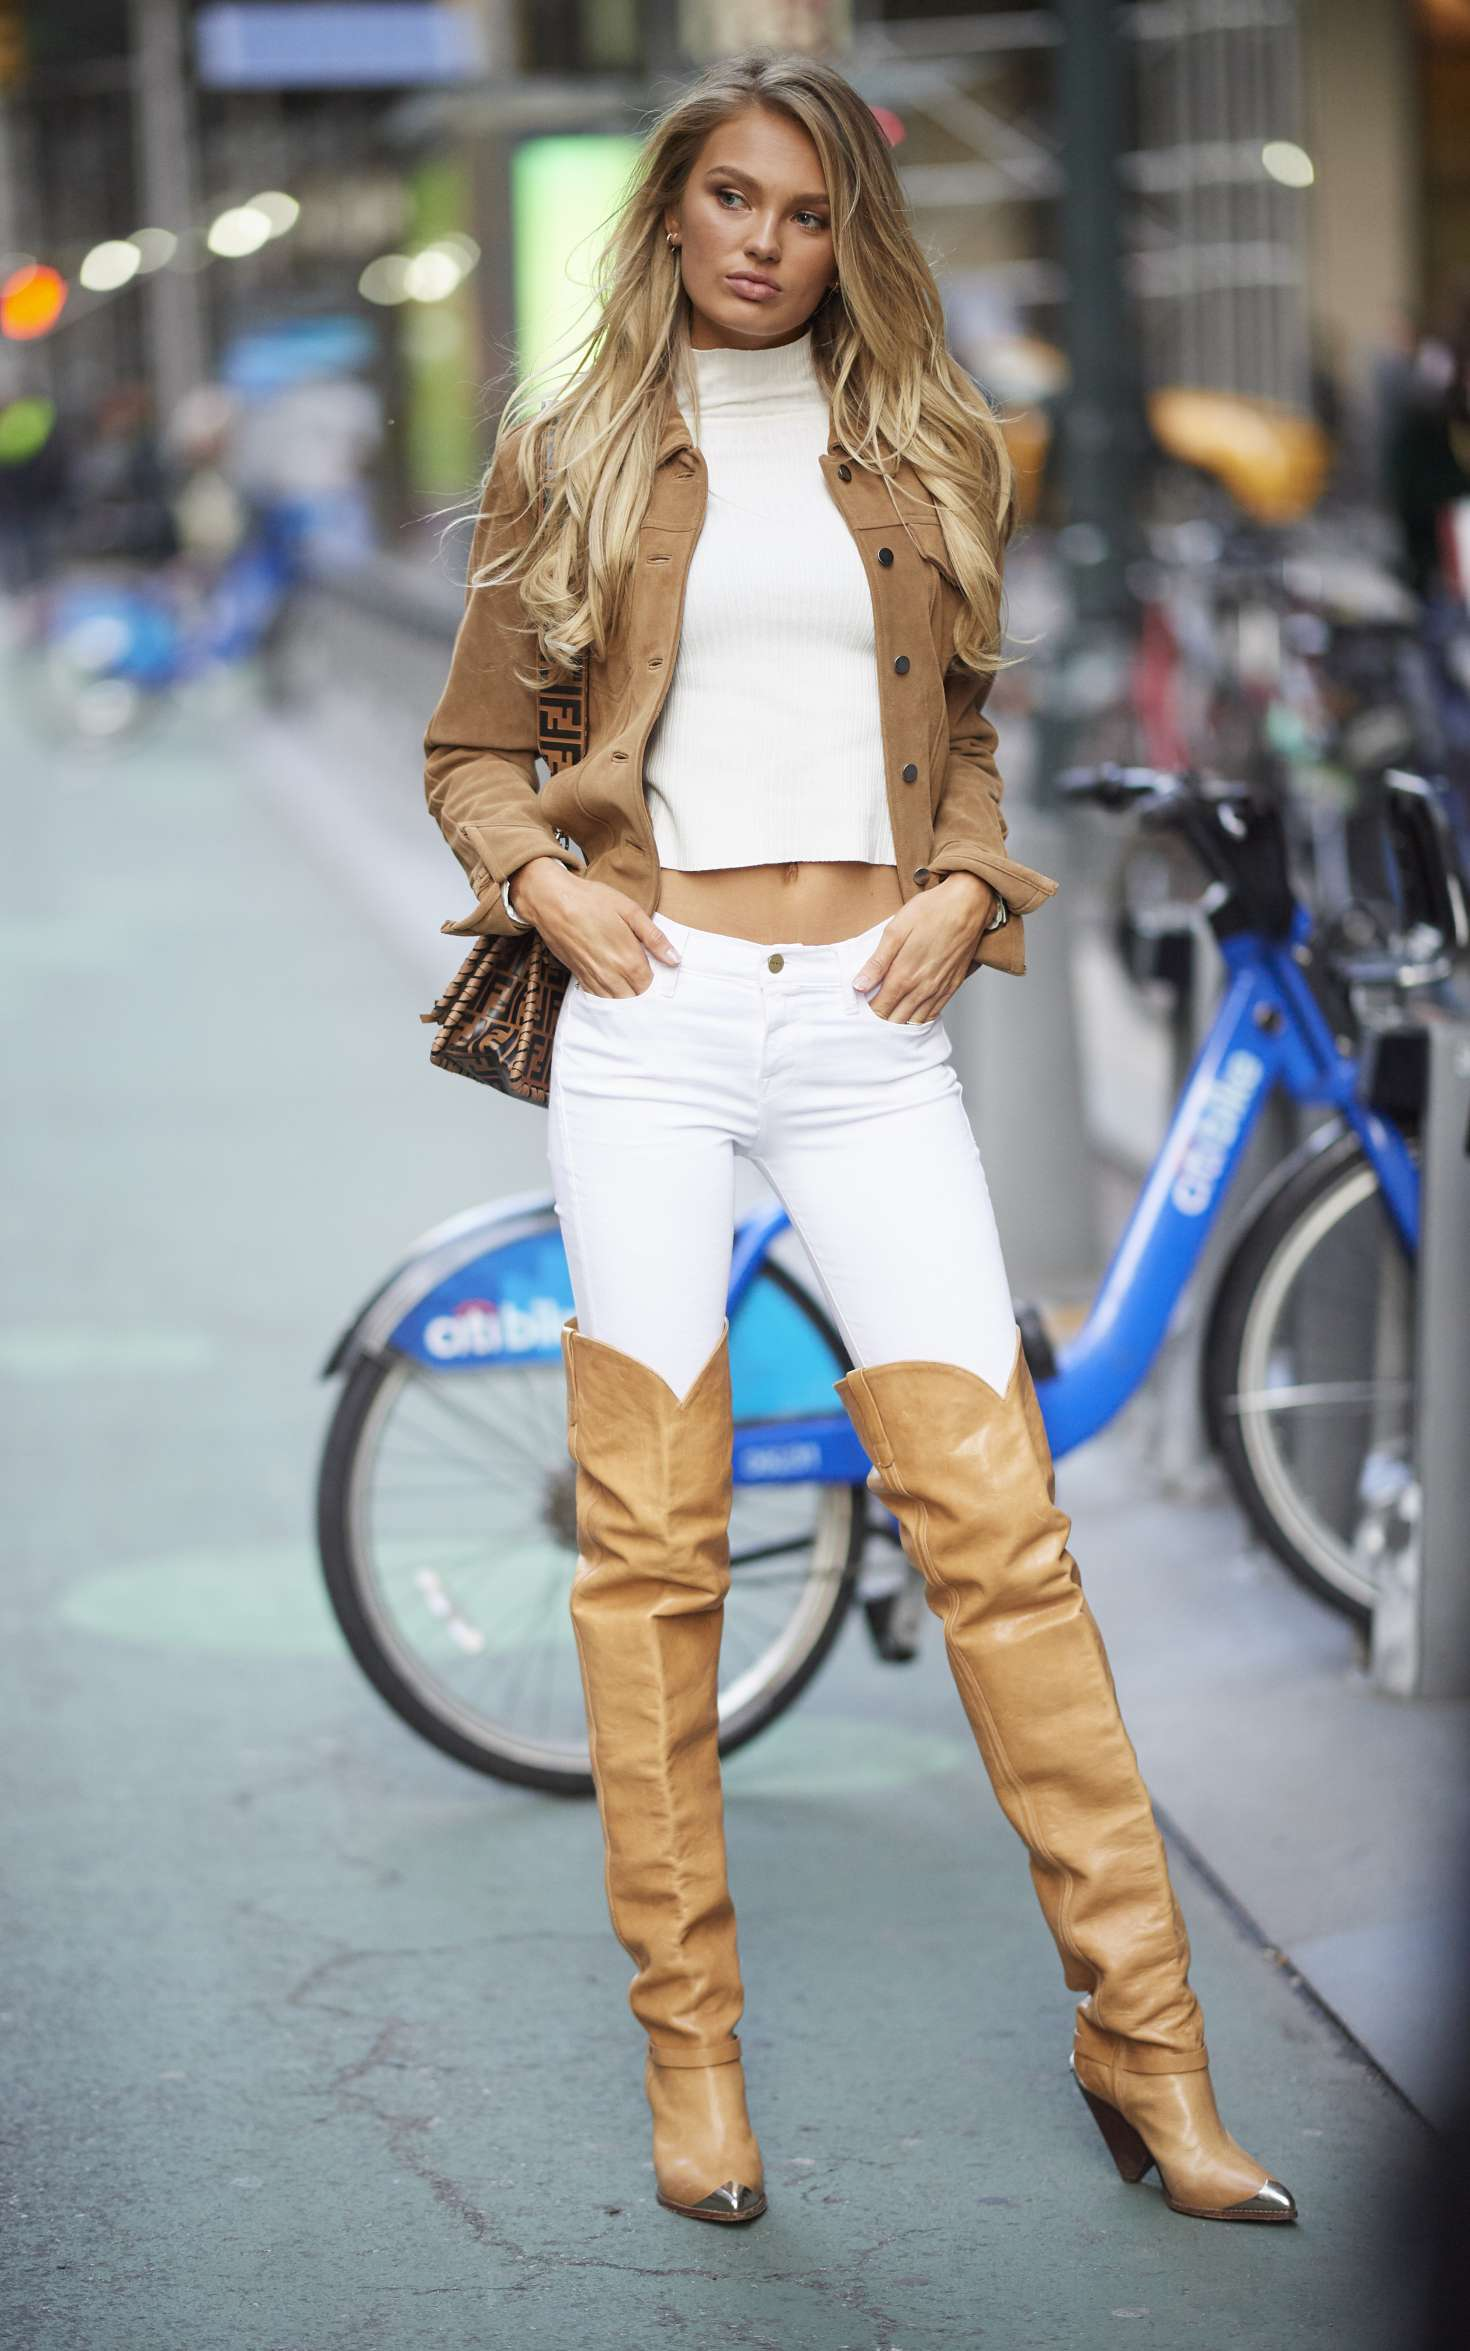 Romee Strijd Romee-Strijd:-Victorias-Secret-Fittings-in-New-York--09